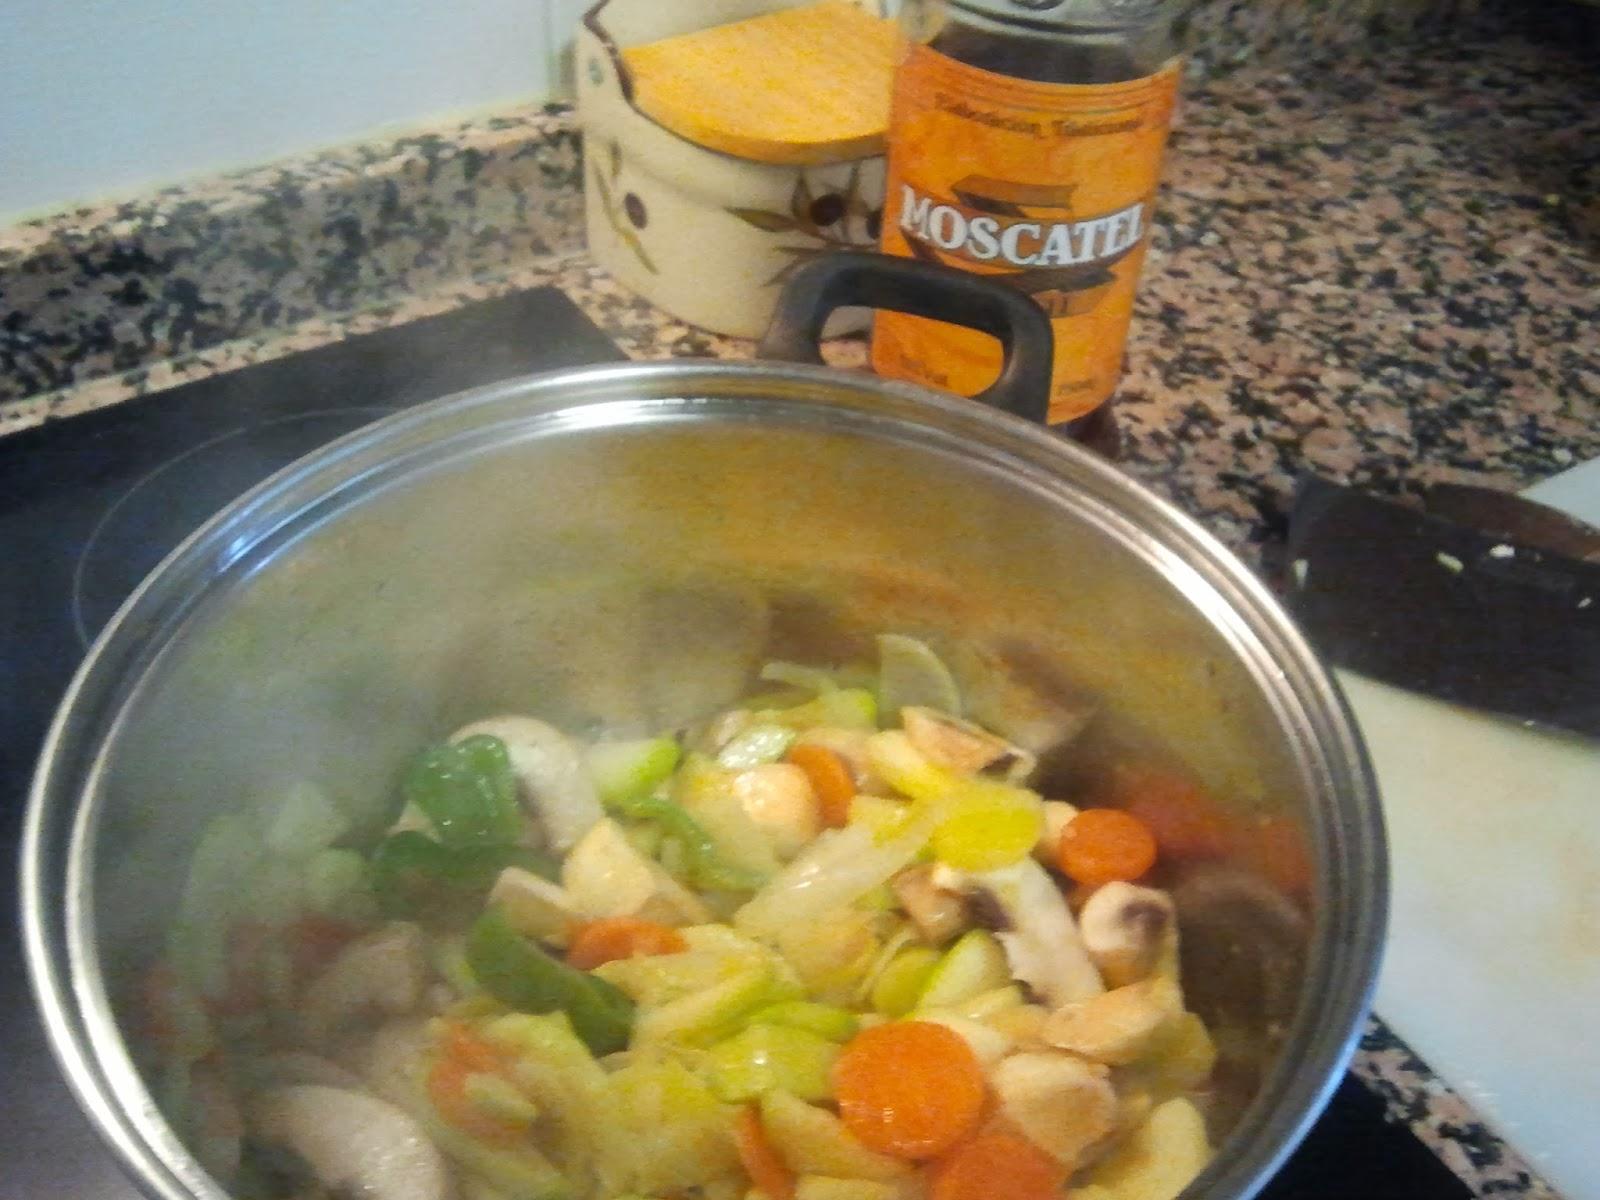 cocinando crema de verduras